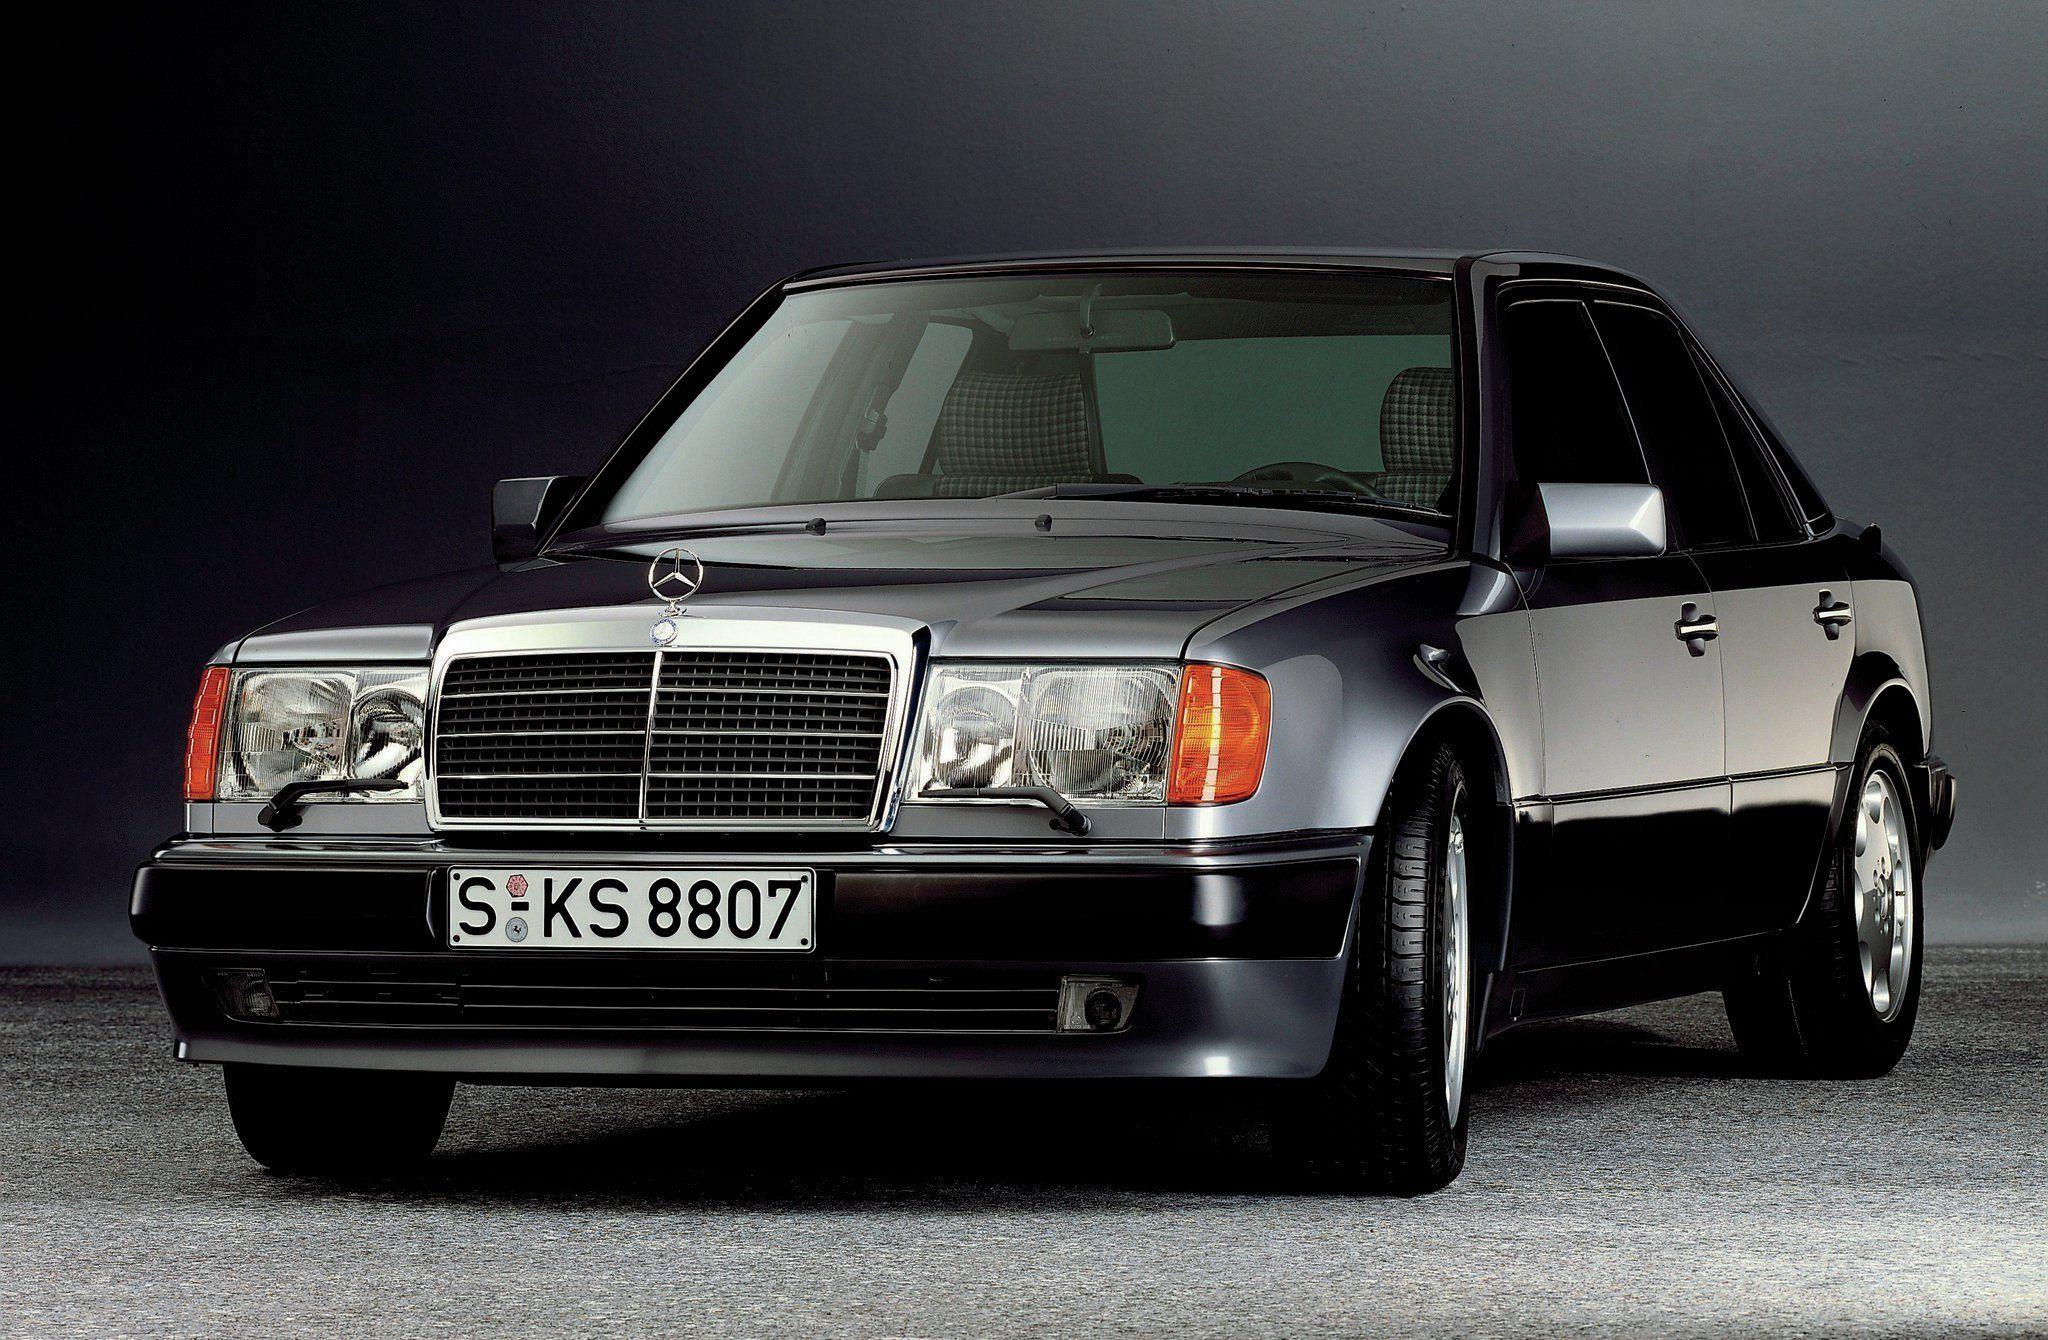 1991 1994 Mercedes Benz 500e E500 W124 Driver Side Front View 01